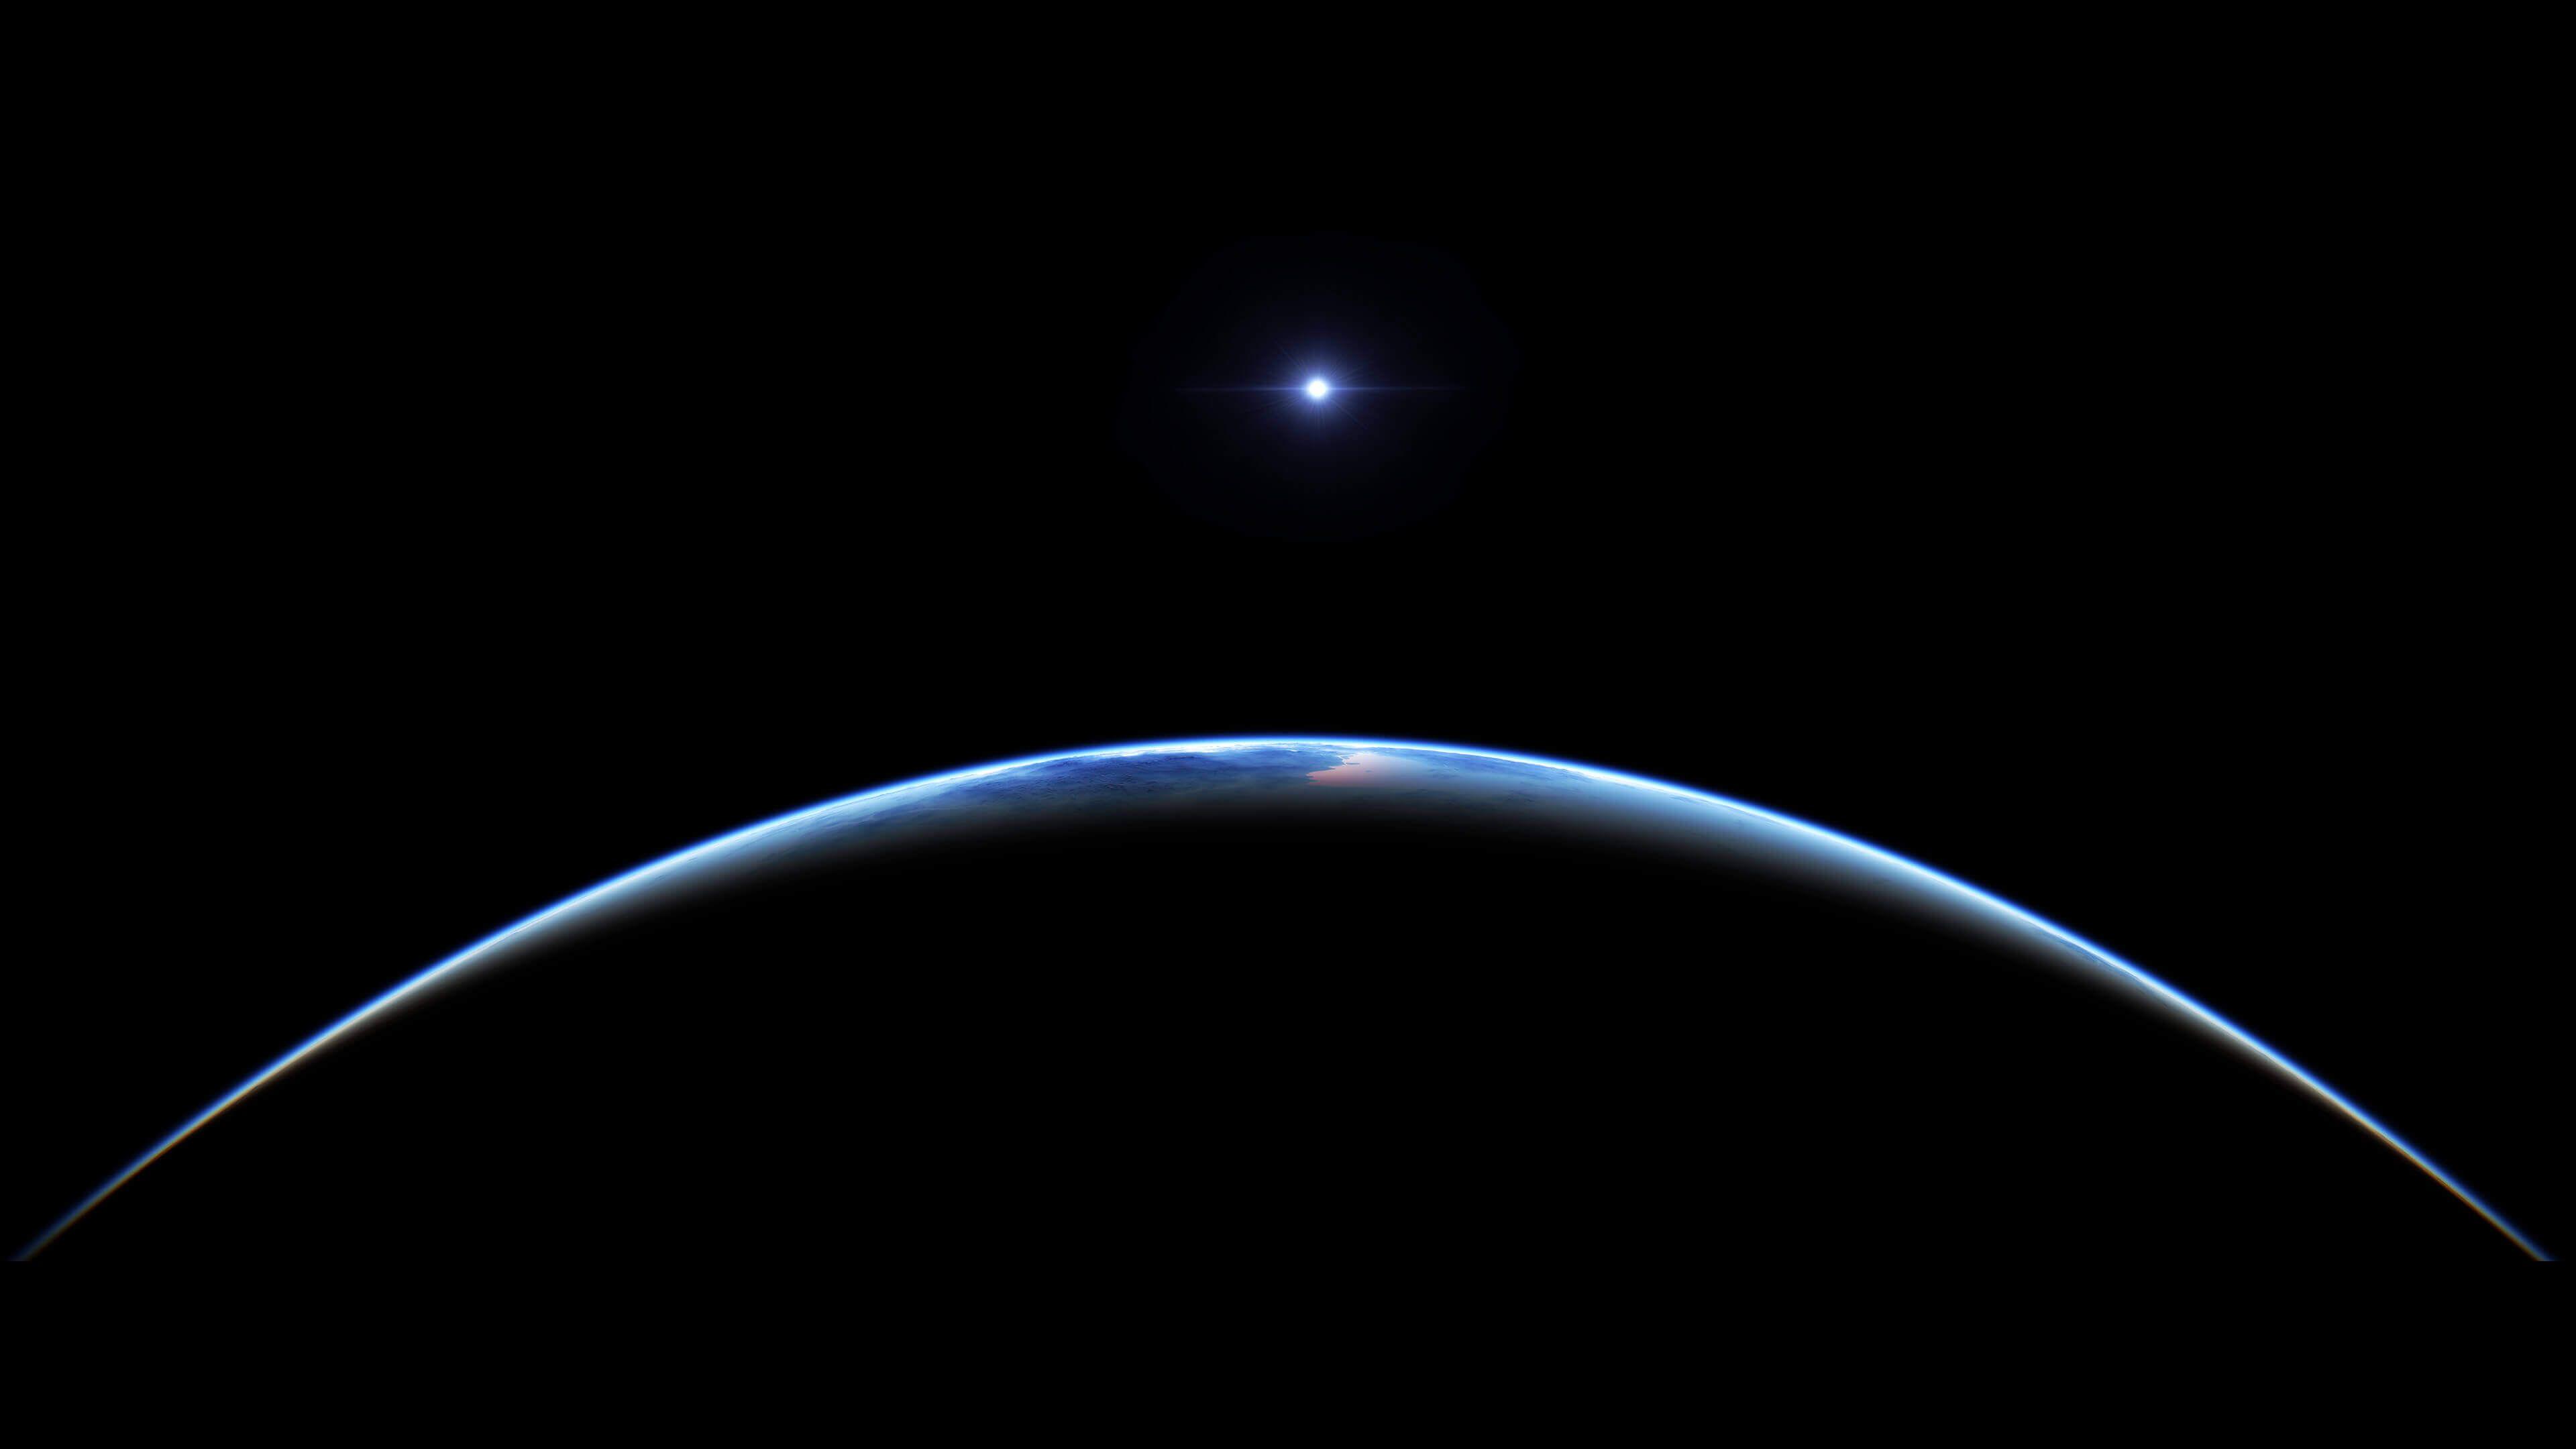 EarthatNightviewfromspace4Kwallpaper.jpg (3840×2160